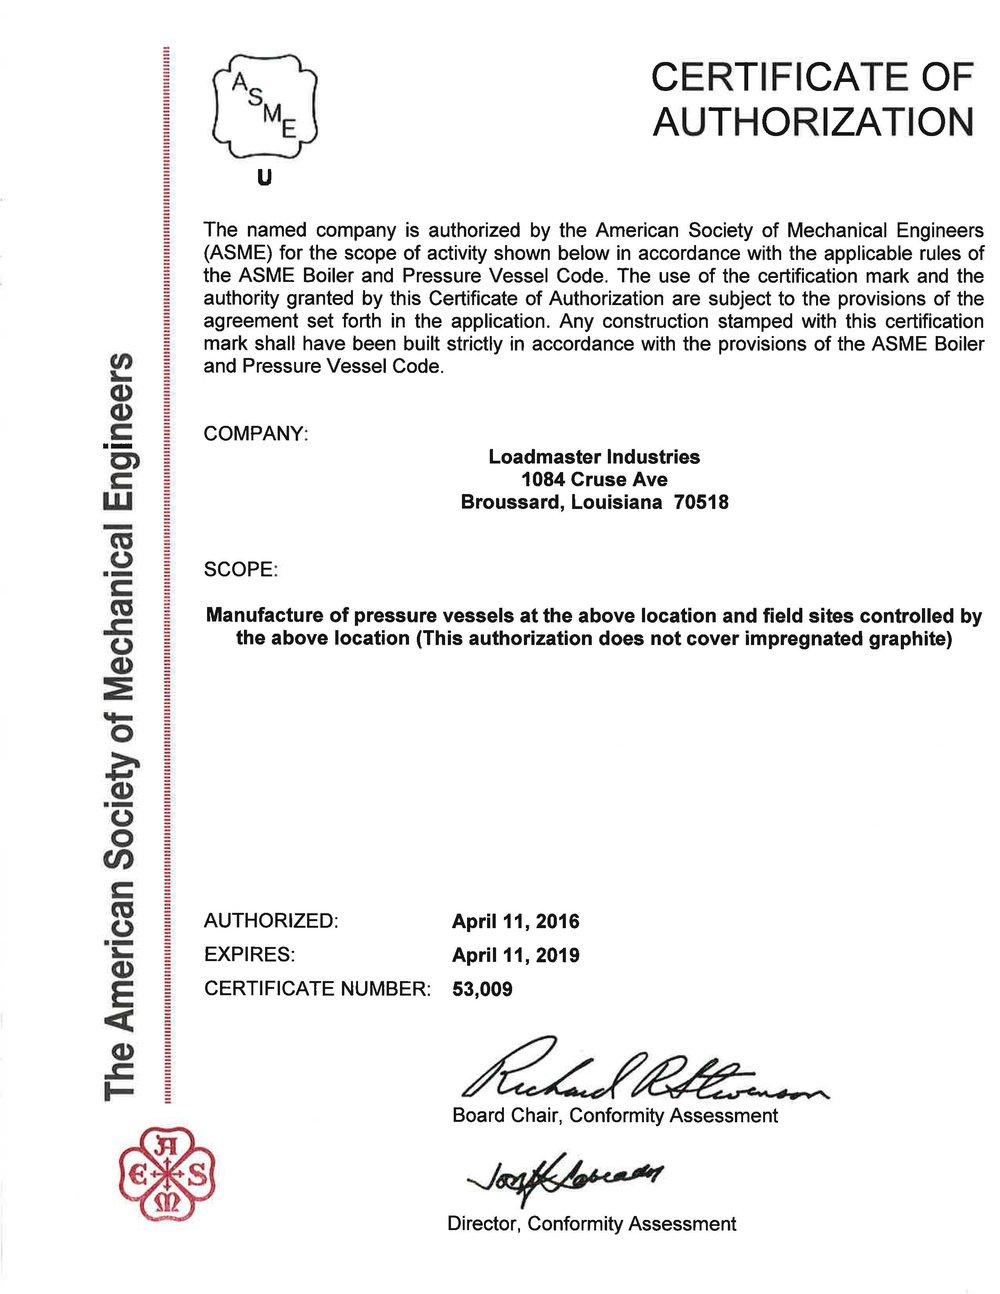 ASME Certificate of Authorization - Pressure Vessels.jpg